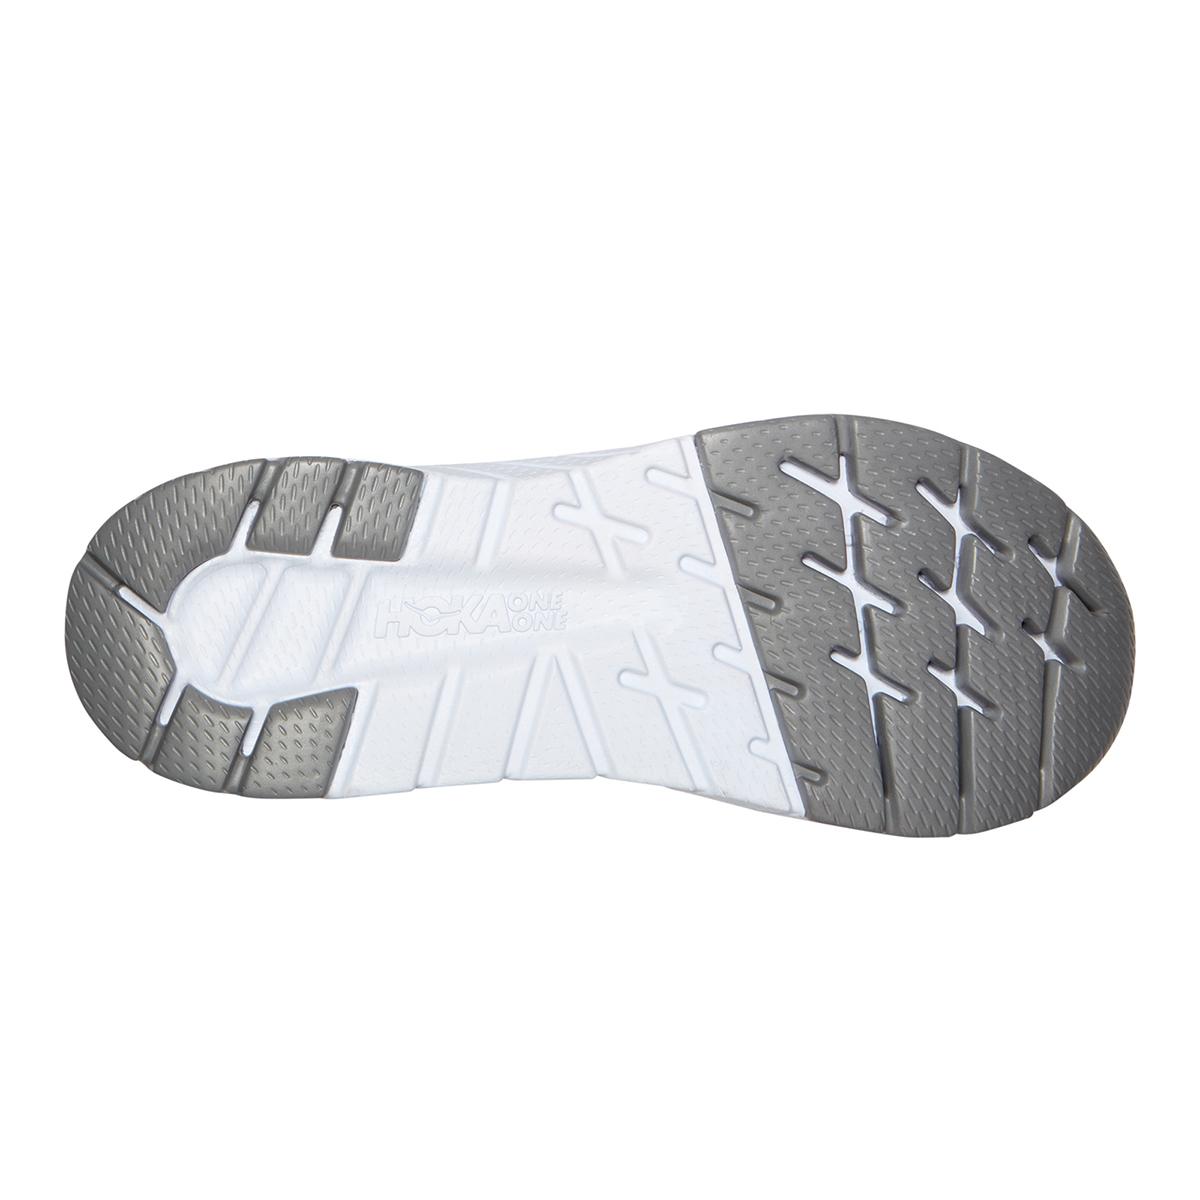 Men's Hoka One One Cavu 3 Running Shoe - Color: Mandarin Red/White - Size: 7 - Width: Regular, Mandarin Red/White, large, image 4